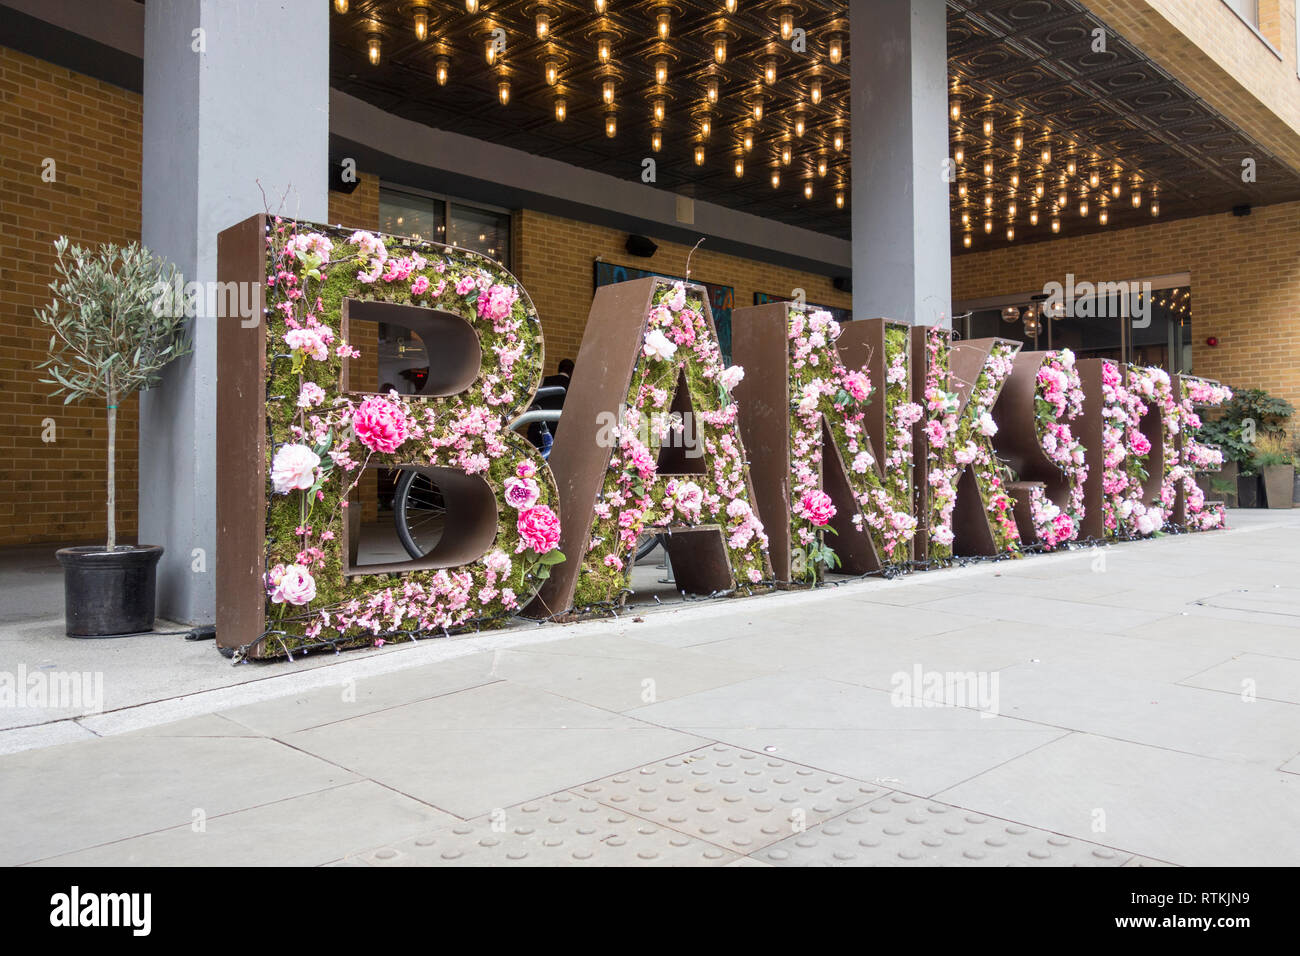 Floral display outside Hilton Hotel, Great Suffolk Street, Bankside, London, SE1, UK Stock Photo